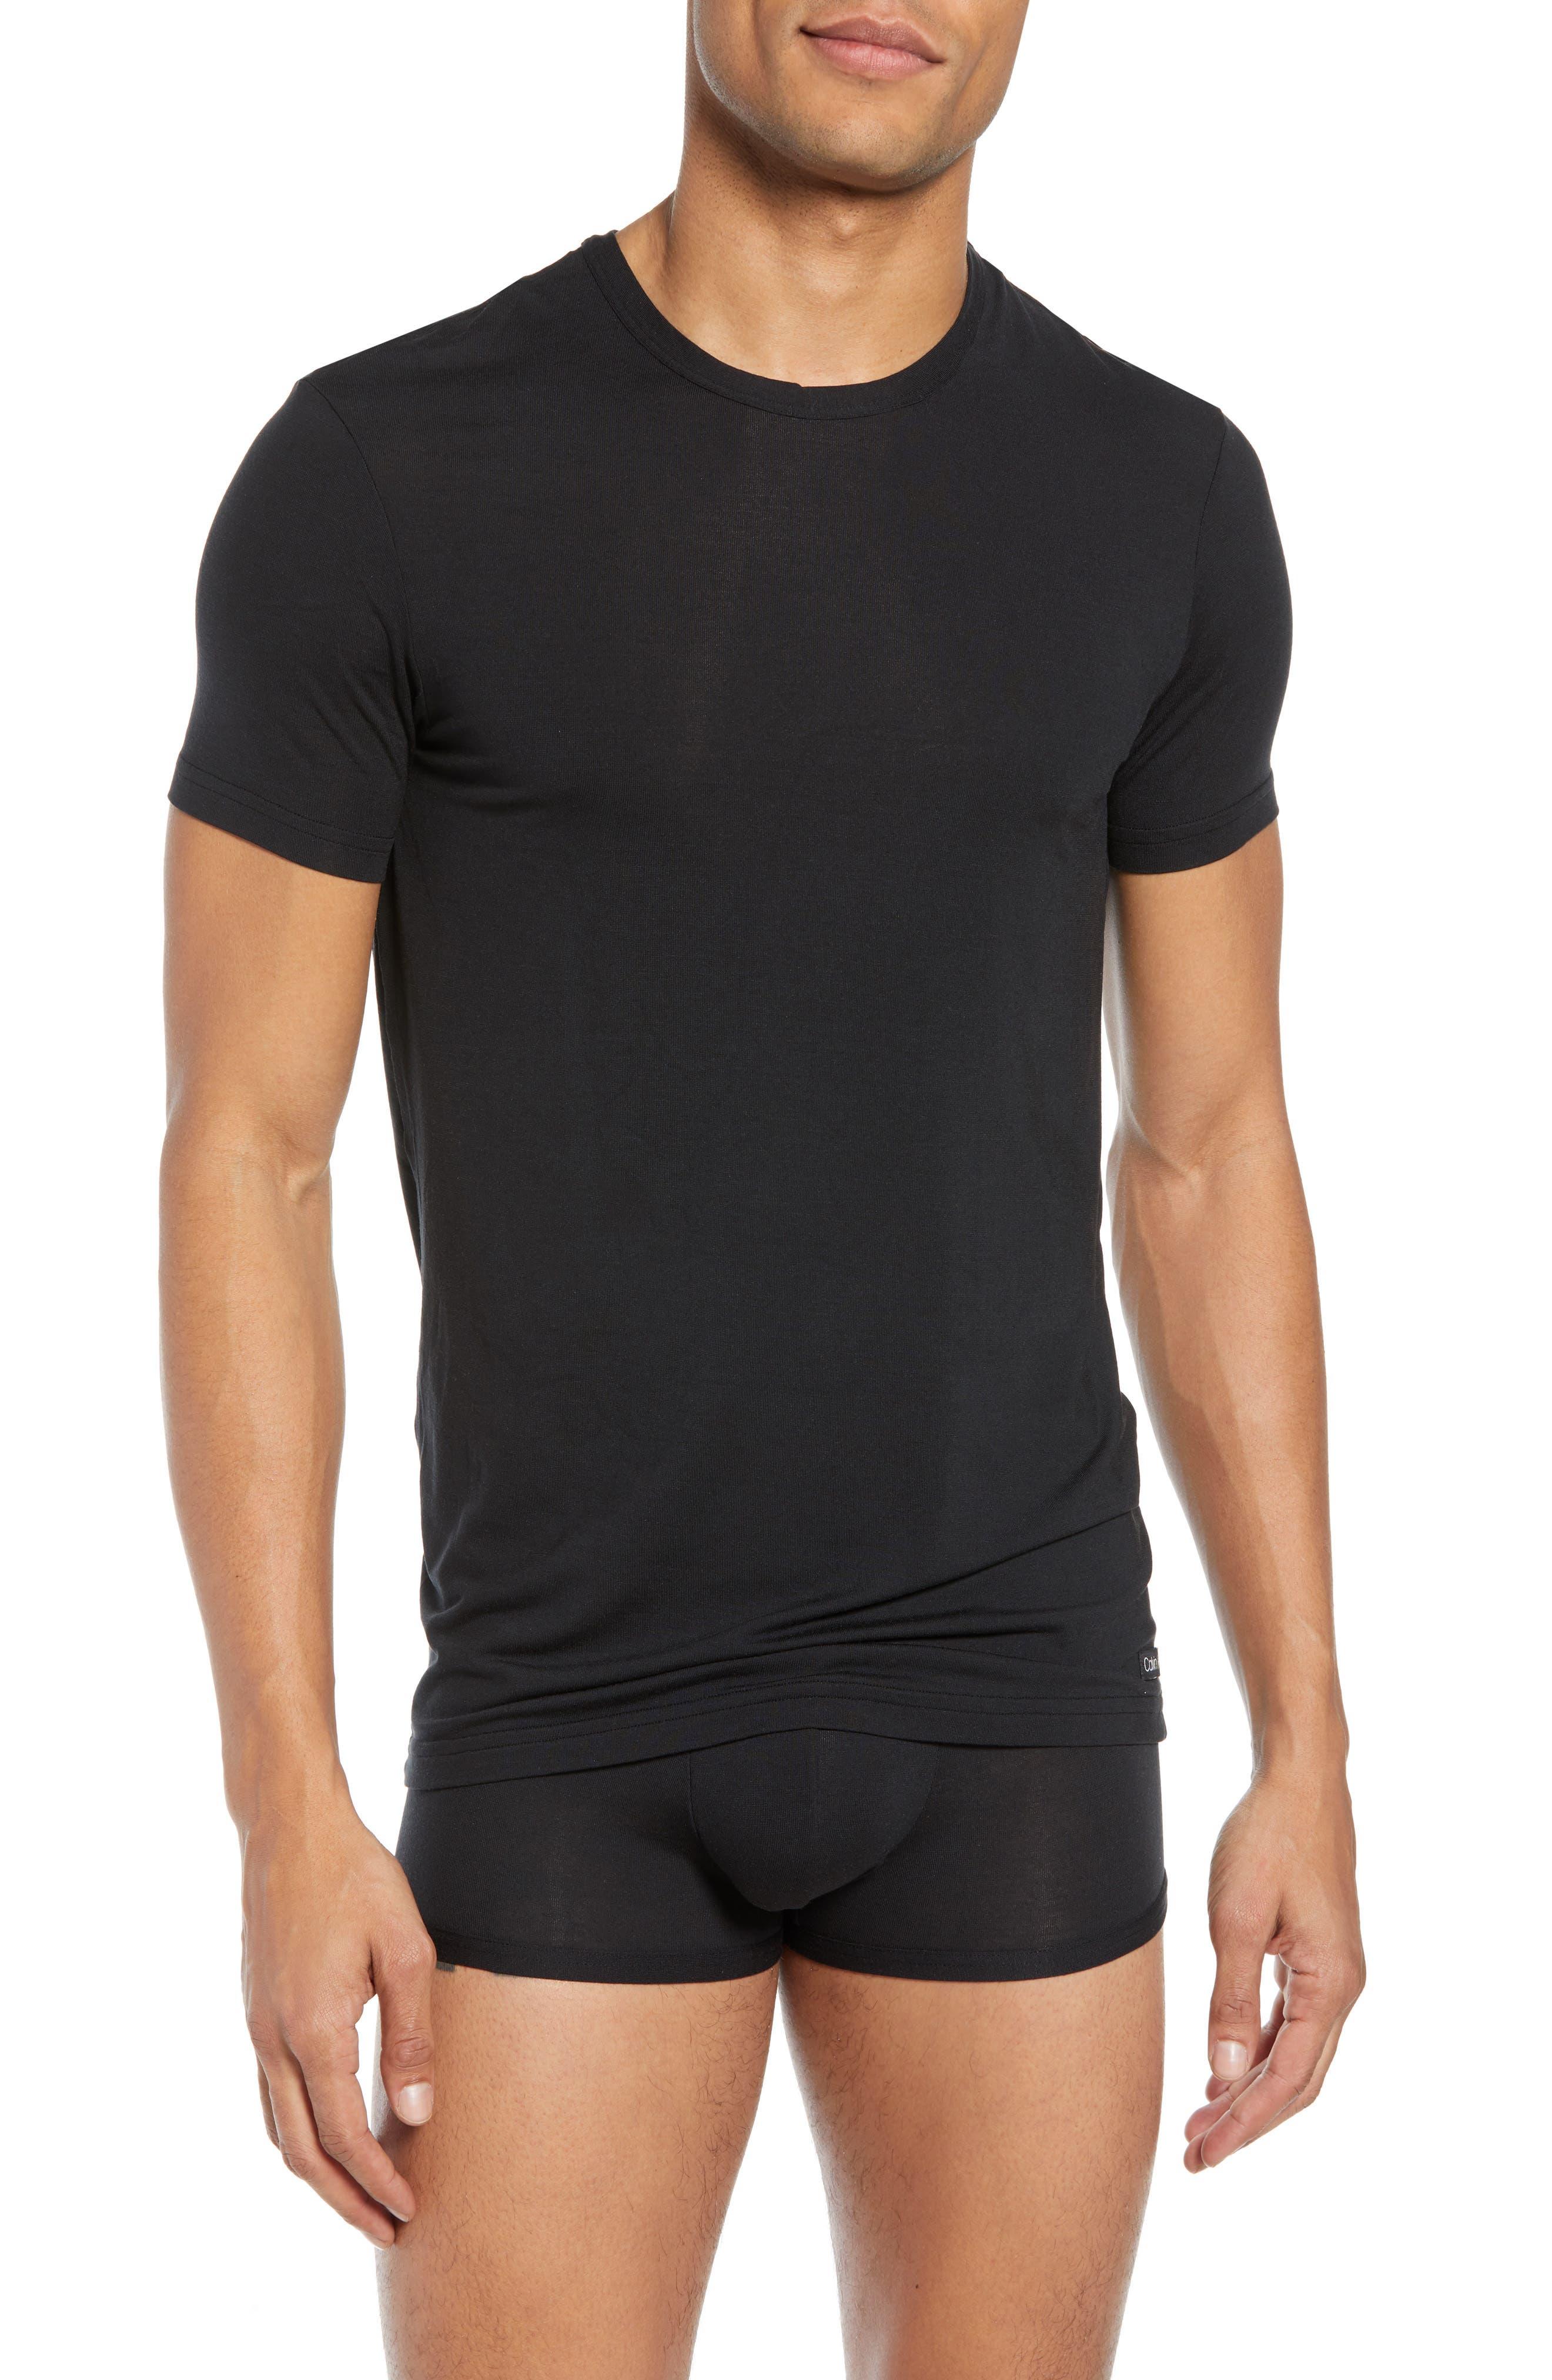 CALVIN KLEIN, Ultrasoft Stretch Modal Blend Crewneck T-Shirt, Main thumbnail 1, color, BLACK